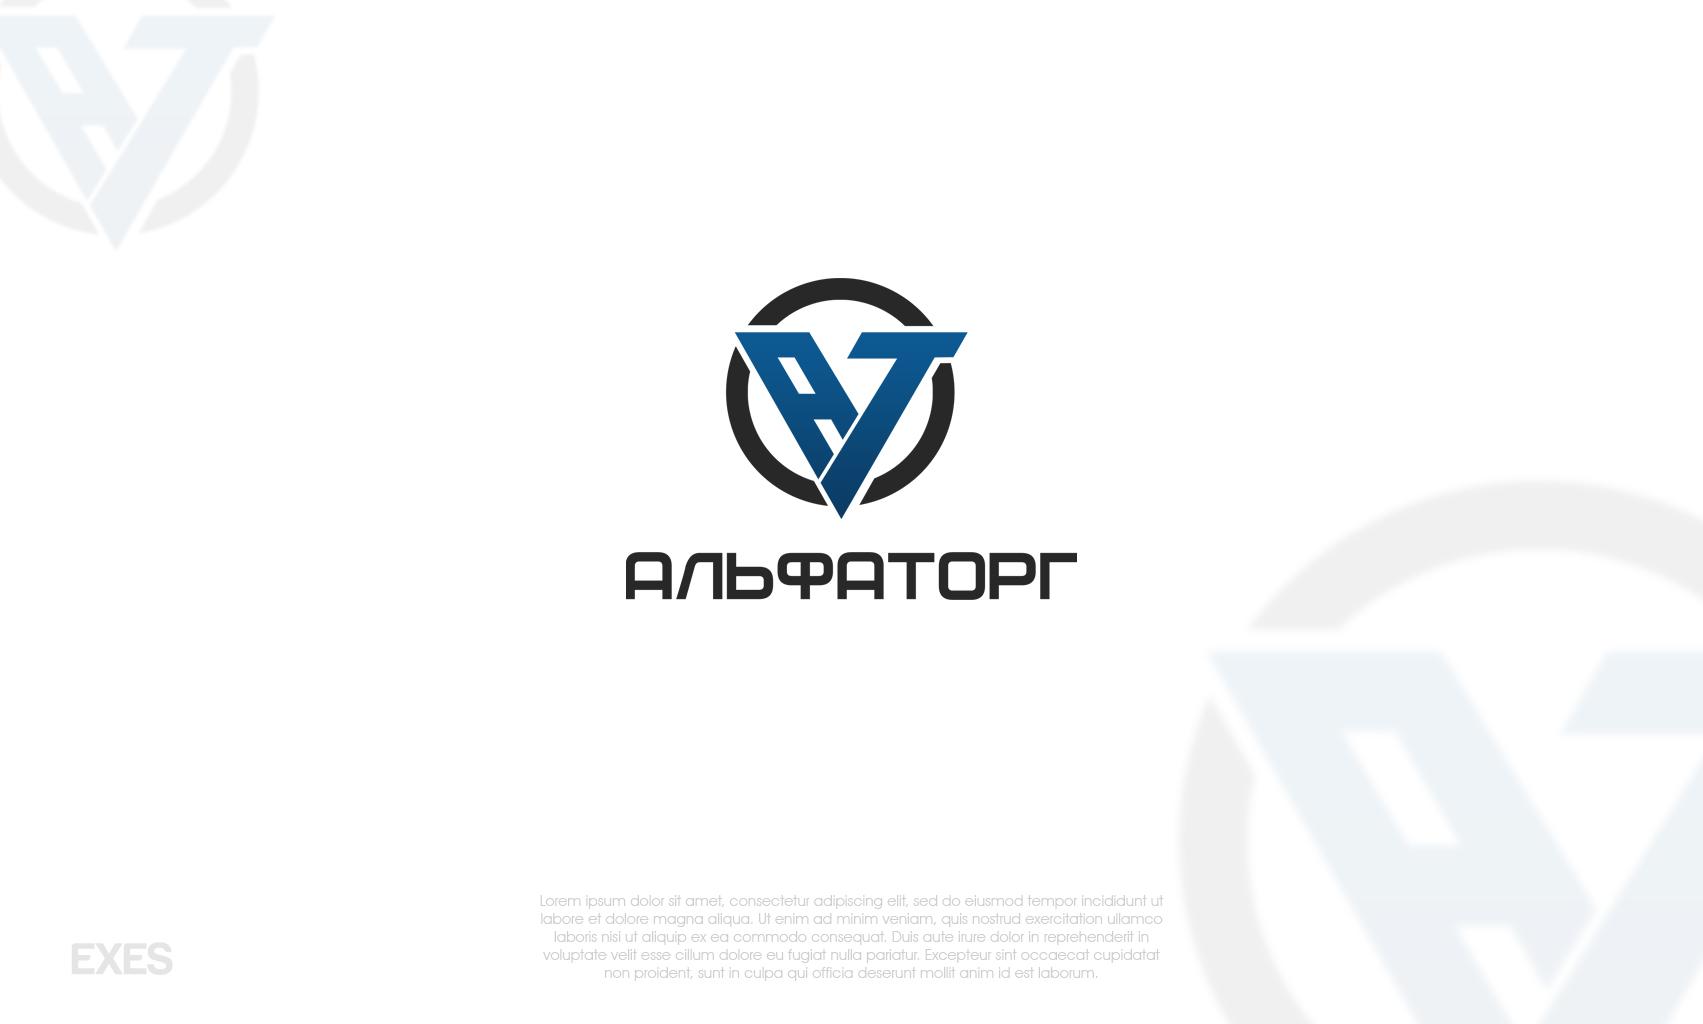 Логотип и фирменный стиль фото f_7195f038f141f843.jpg